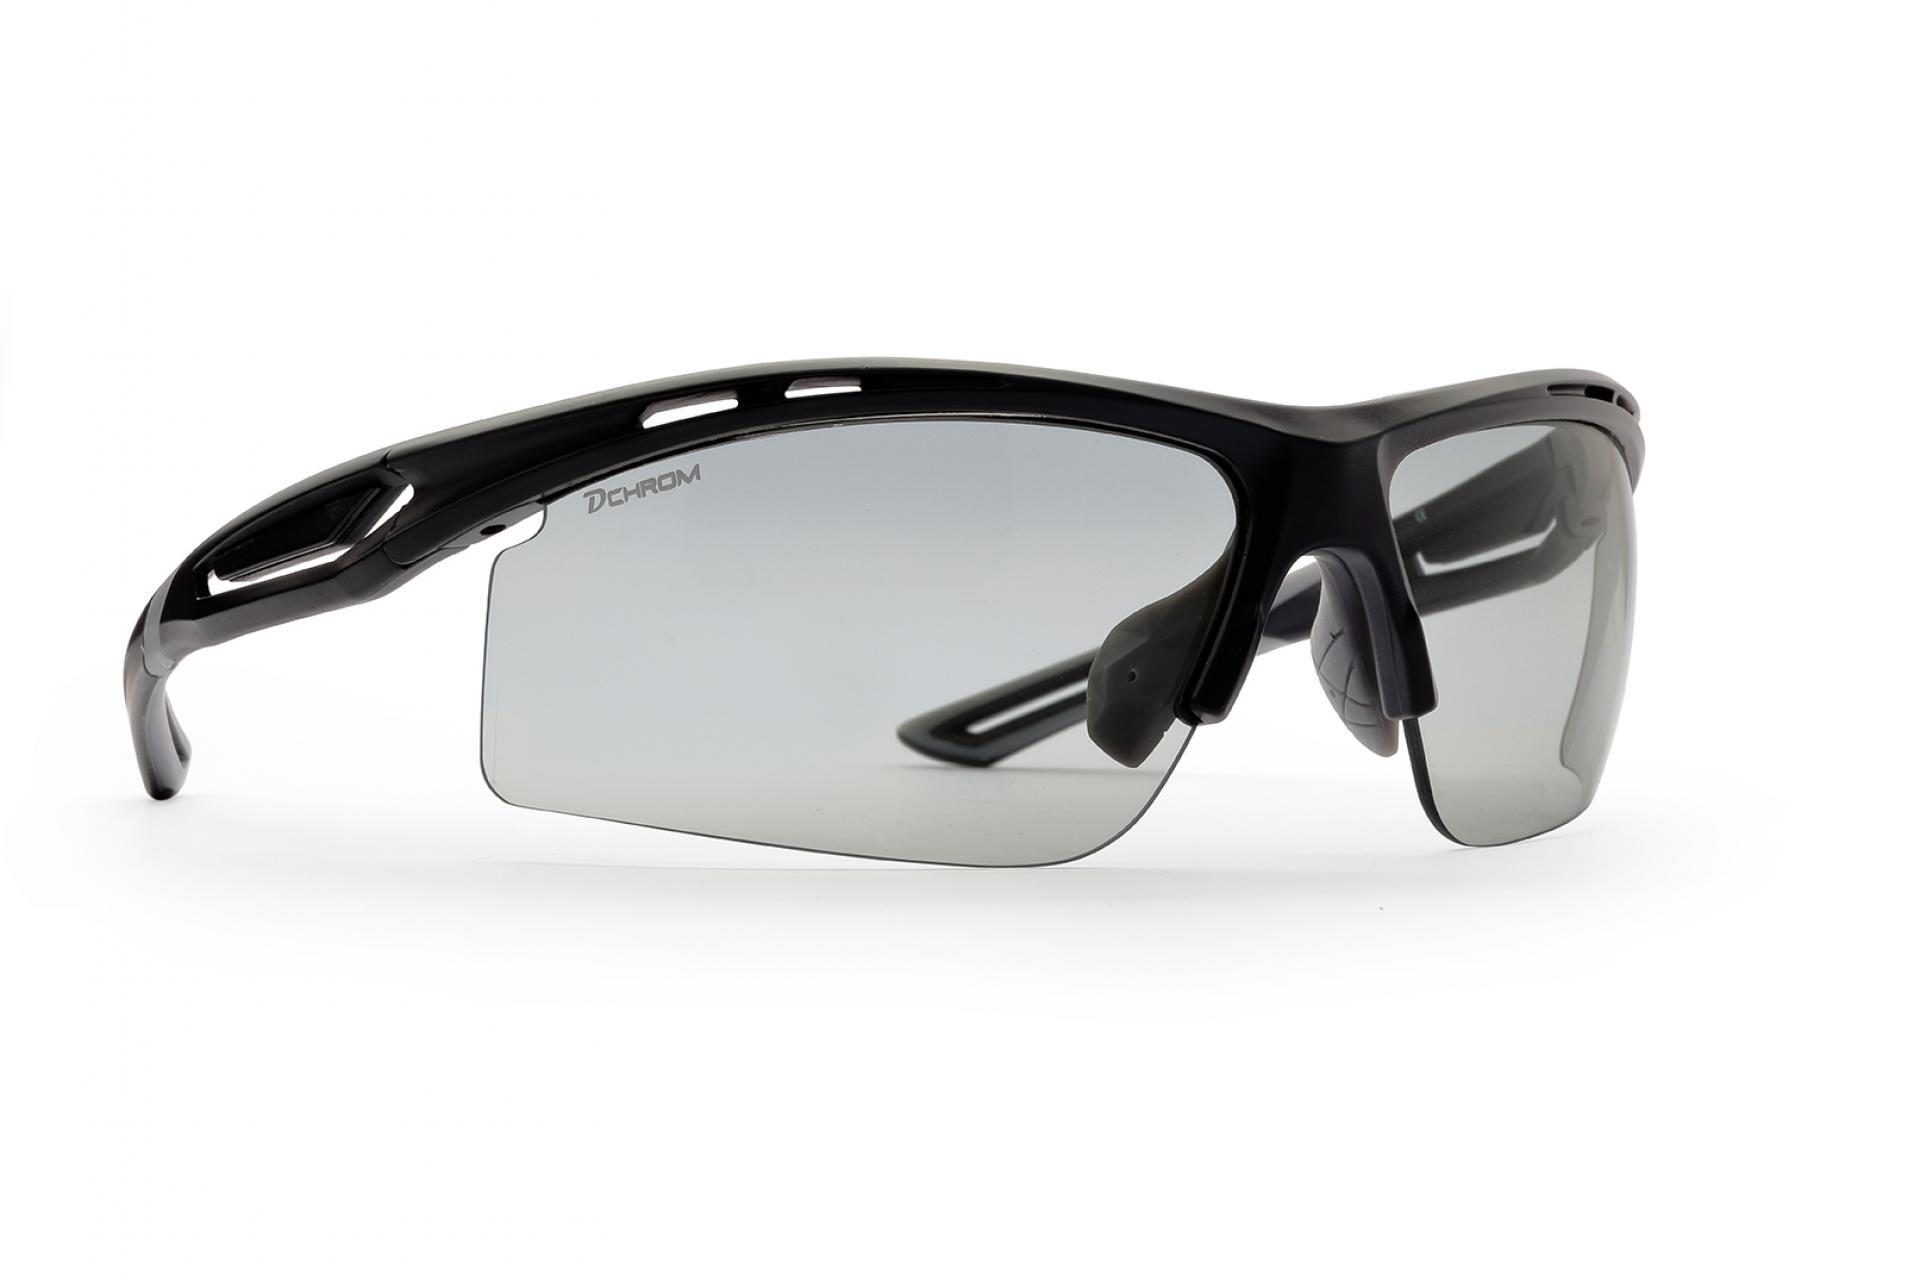 Demon Cabana DCHROM - Løbe- og cykelbrille med fotokromiske linser - Matsort   Glasses